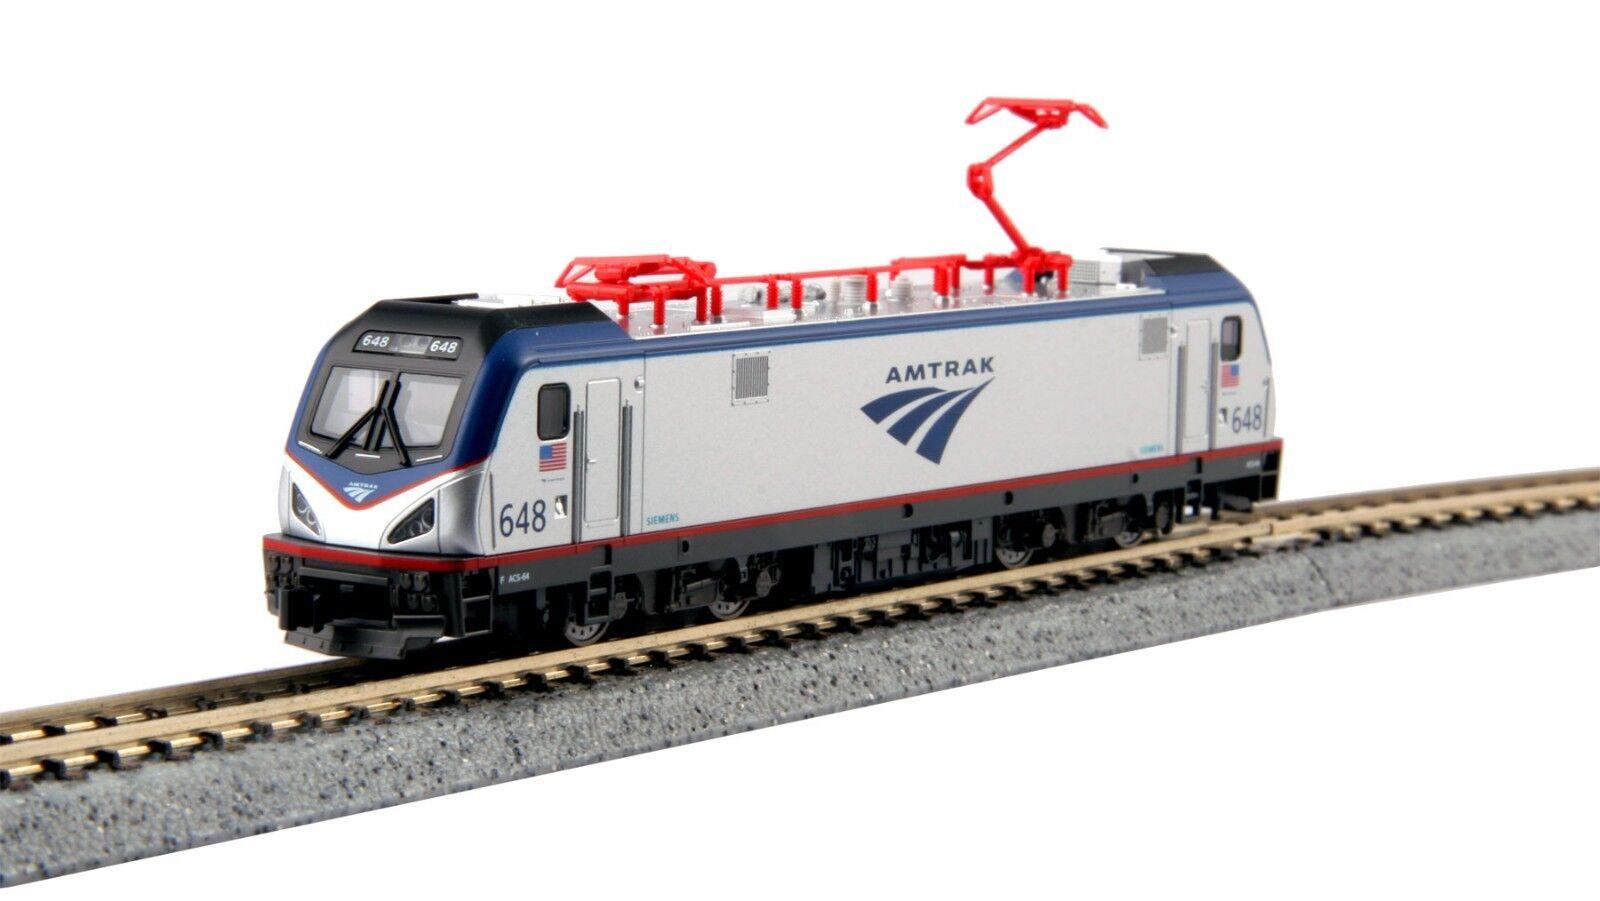 N Scale - KATO 137-3003 AMTRAK ACS-64 Locomotive   648 DCC Ready